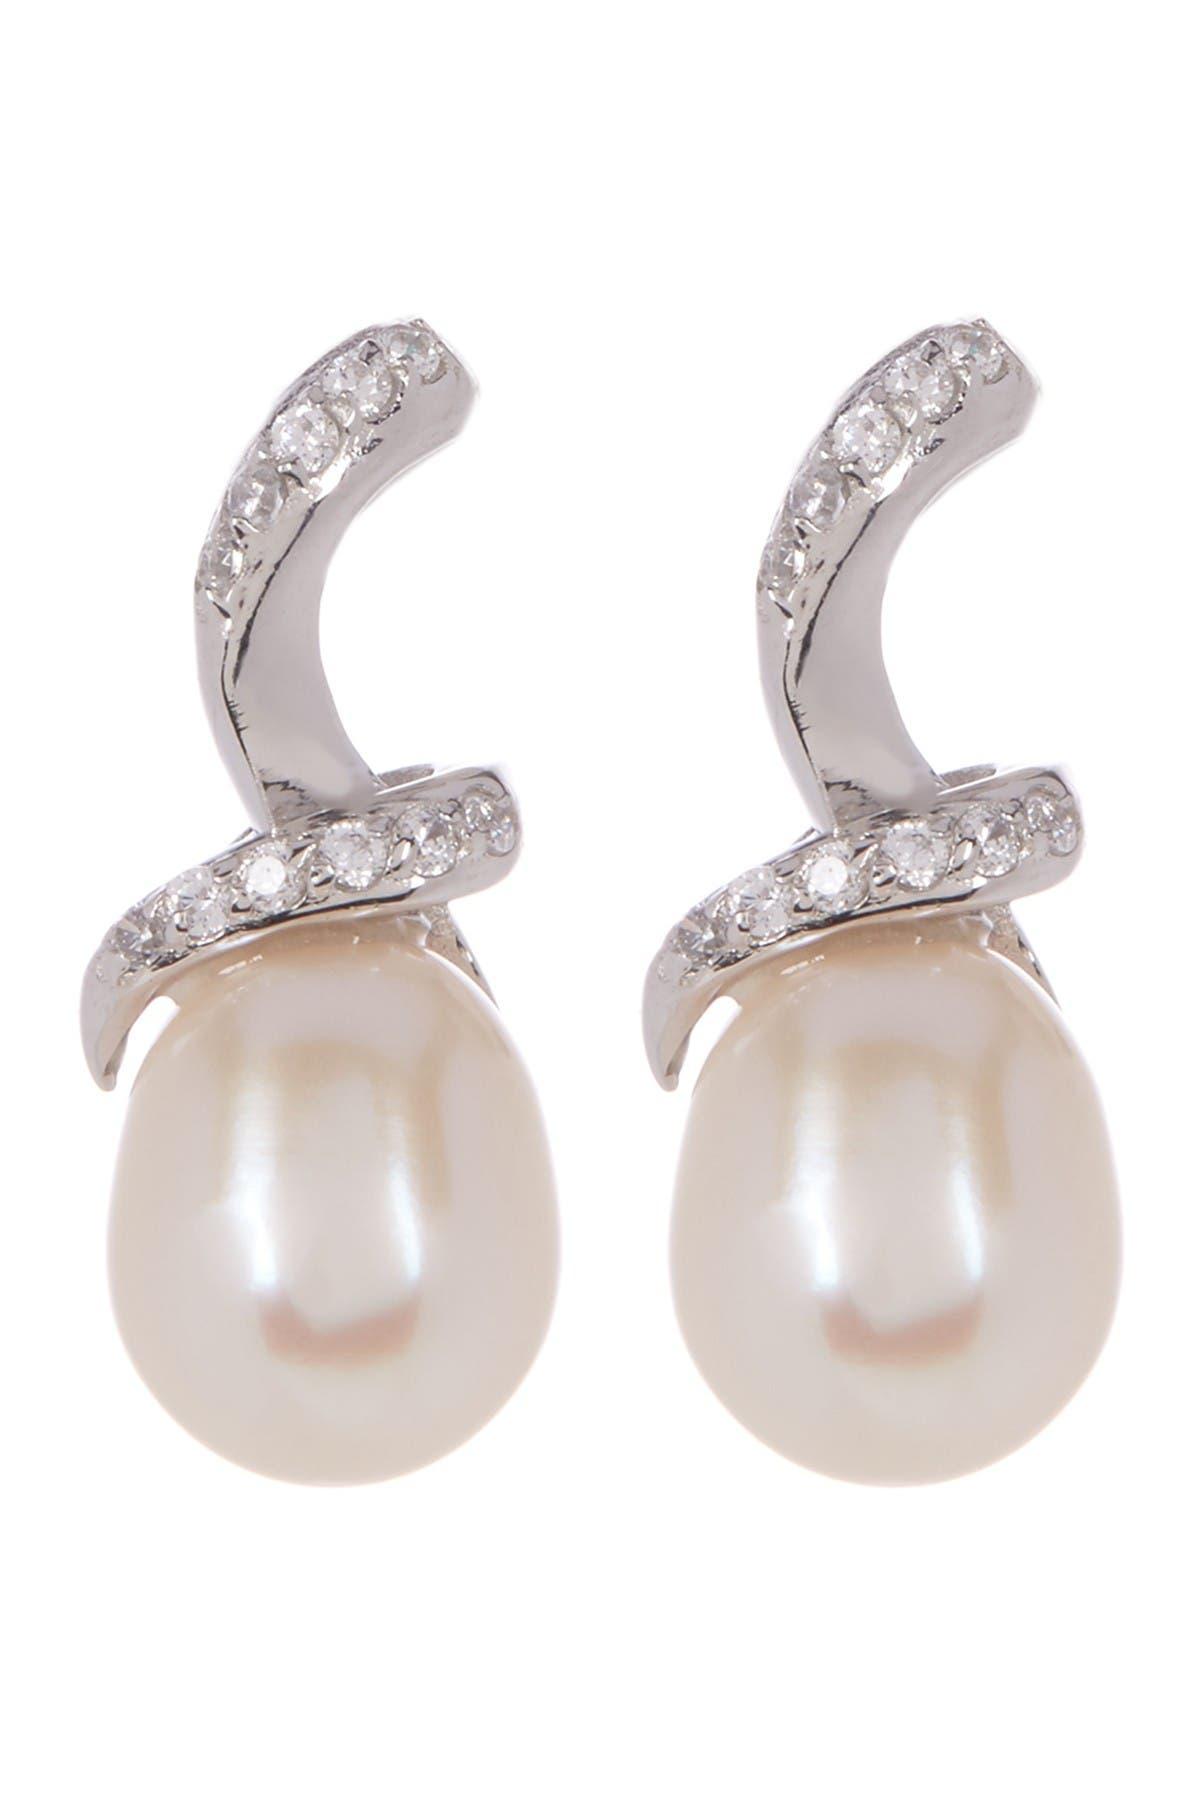 Image of Splendid Pearls Fancy Dangling 7.5-8mm Cultured Freshwater Pearl Earrings